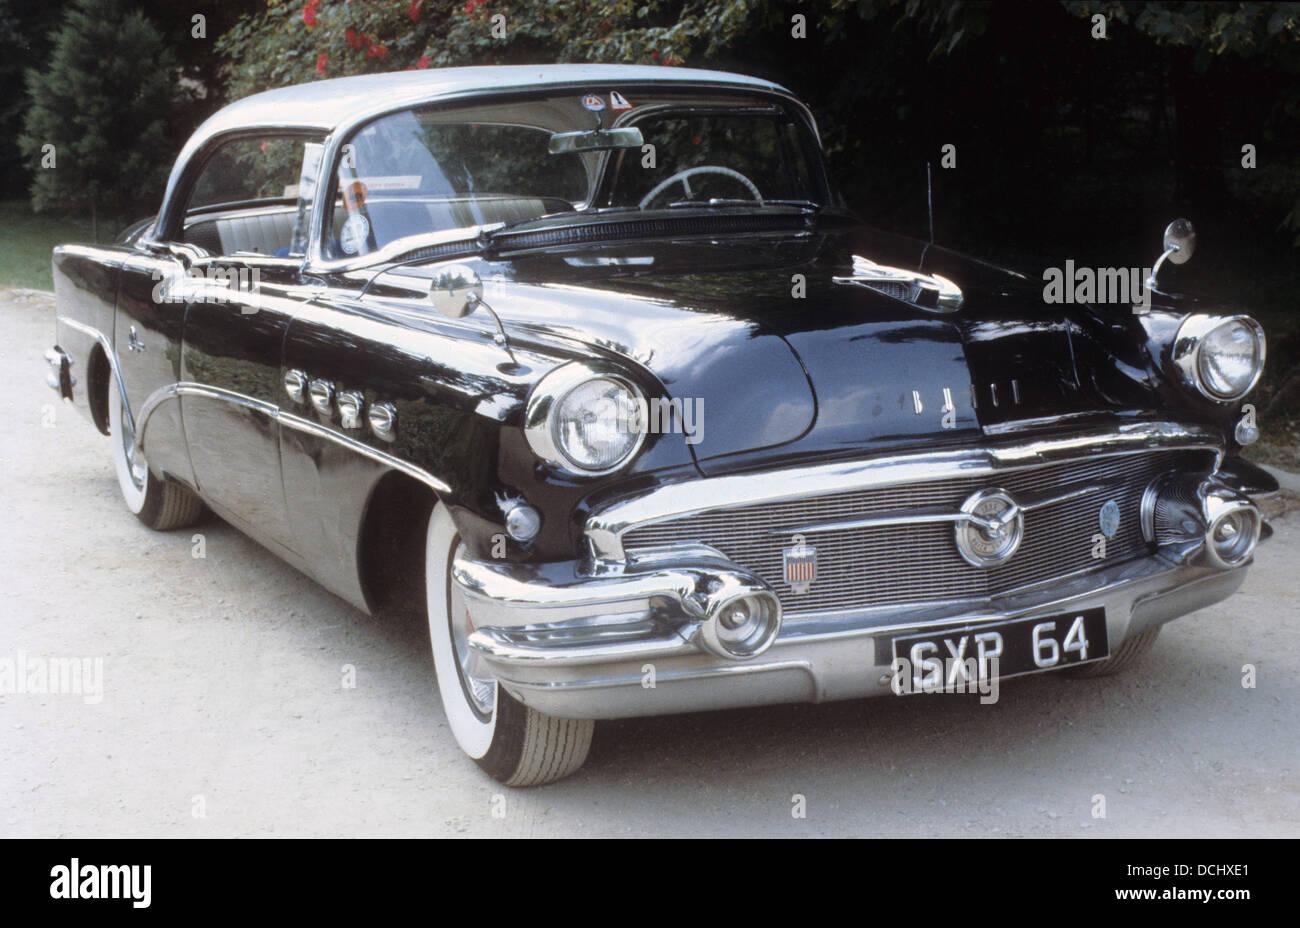 1956 BUICK SUPER - Stock Image